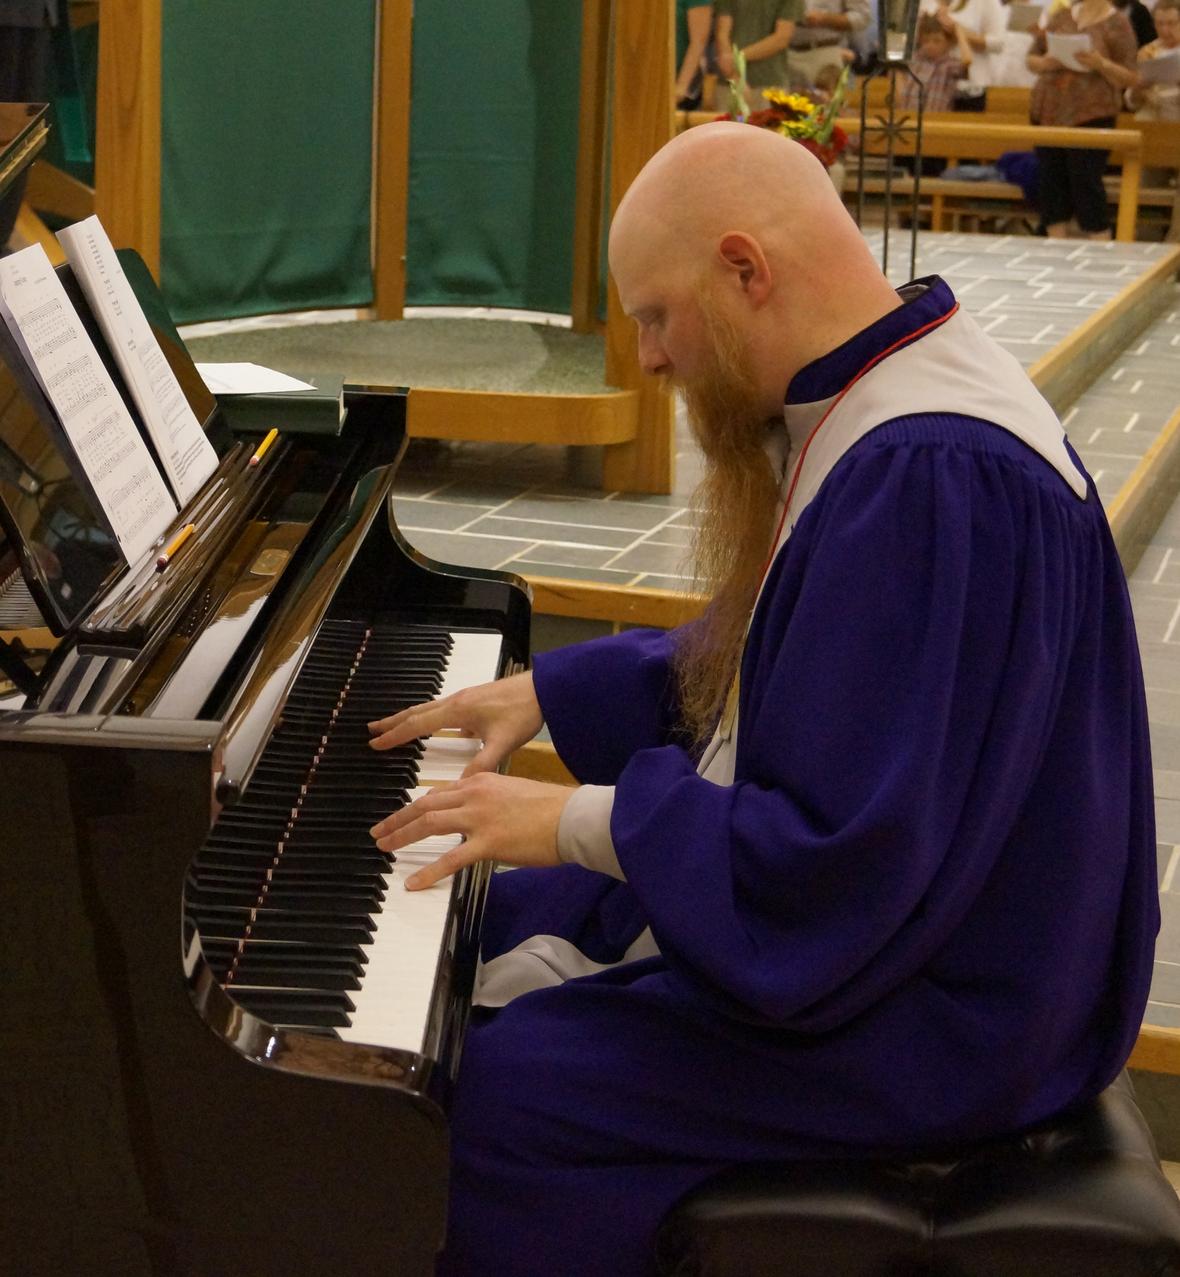 patrick piano